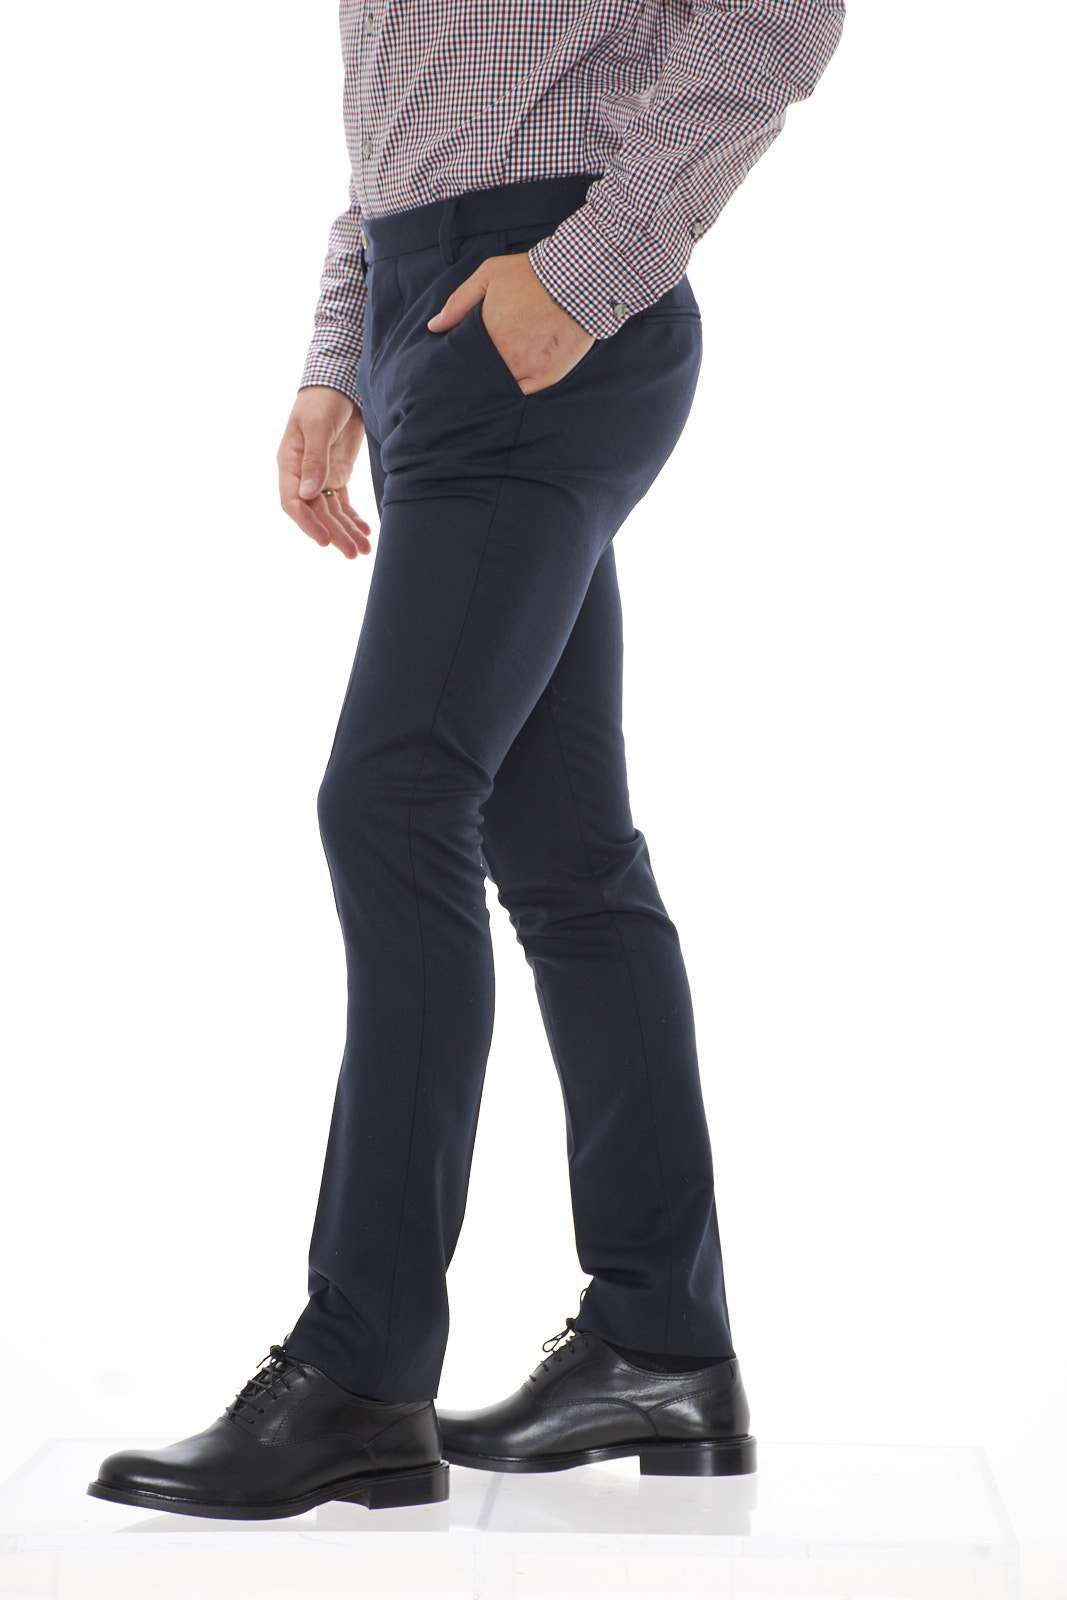 https://www.parmax.com/media/catalog/product/a/i/ai-outlet_parmax-pantaloni-uomo-entre-amis-a198346520-b.jpg